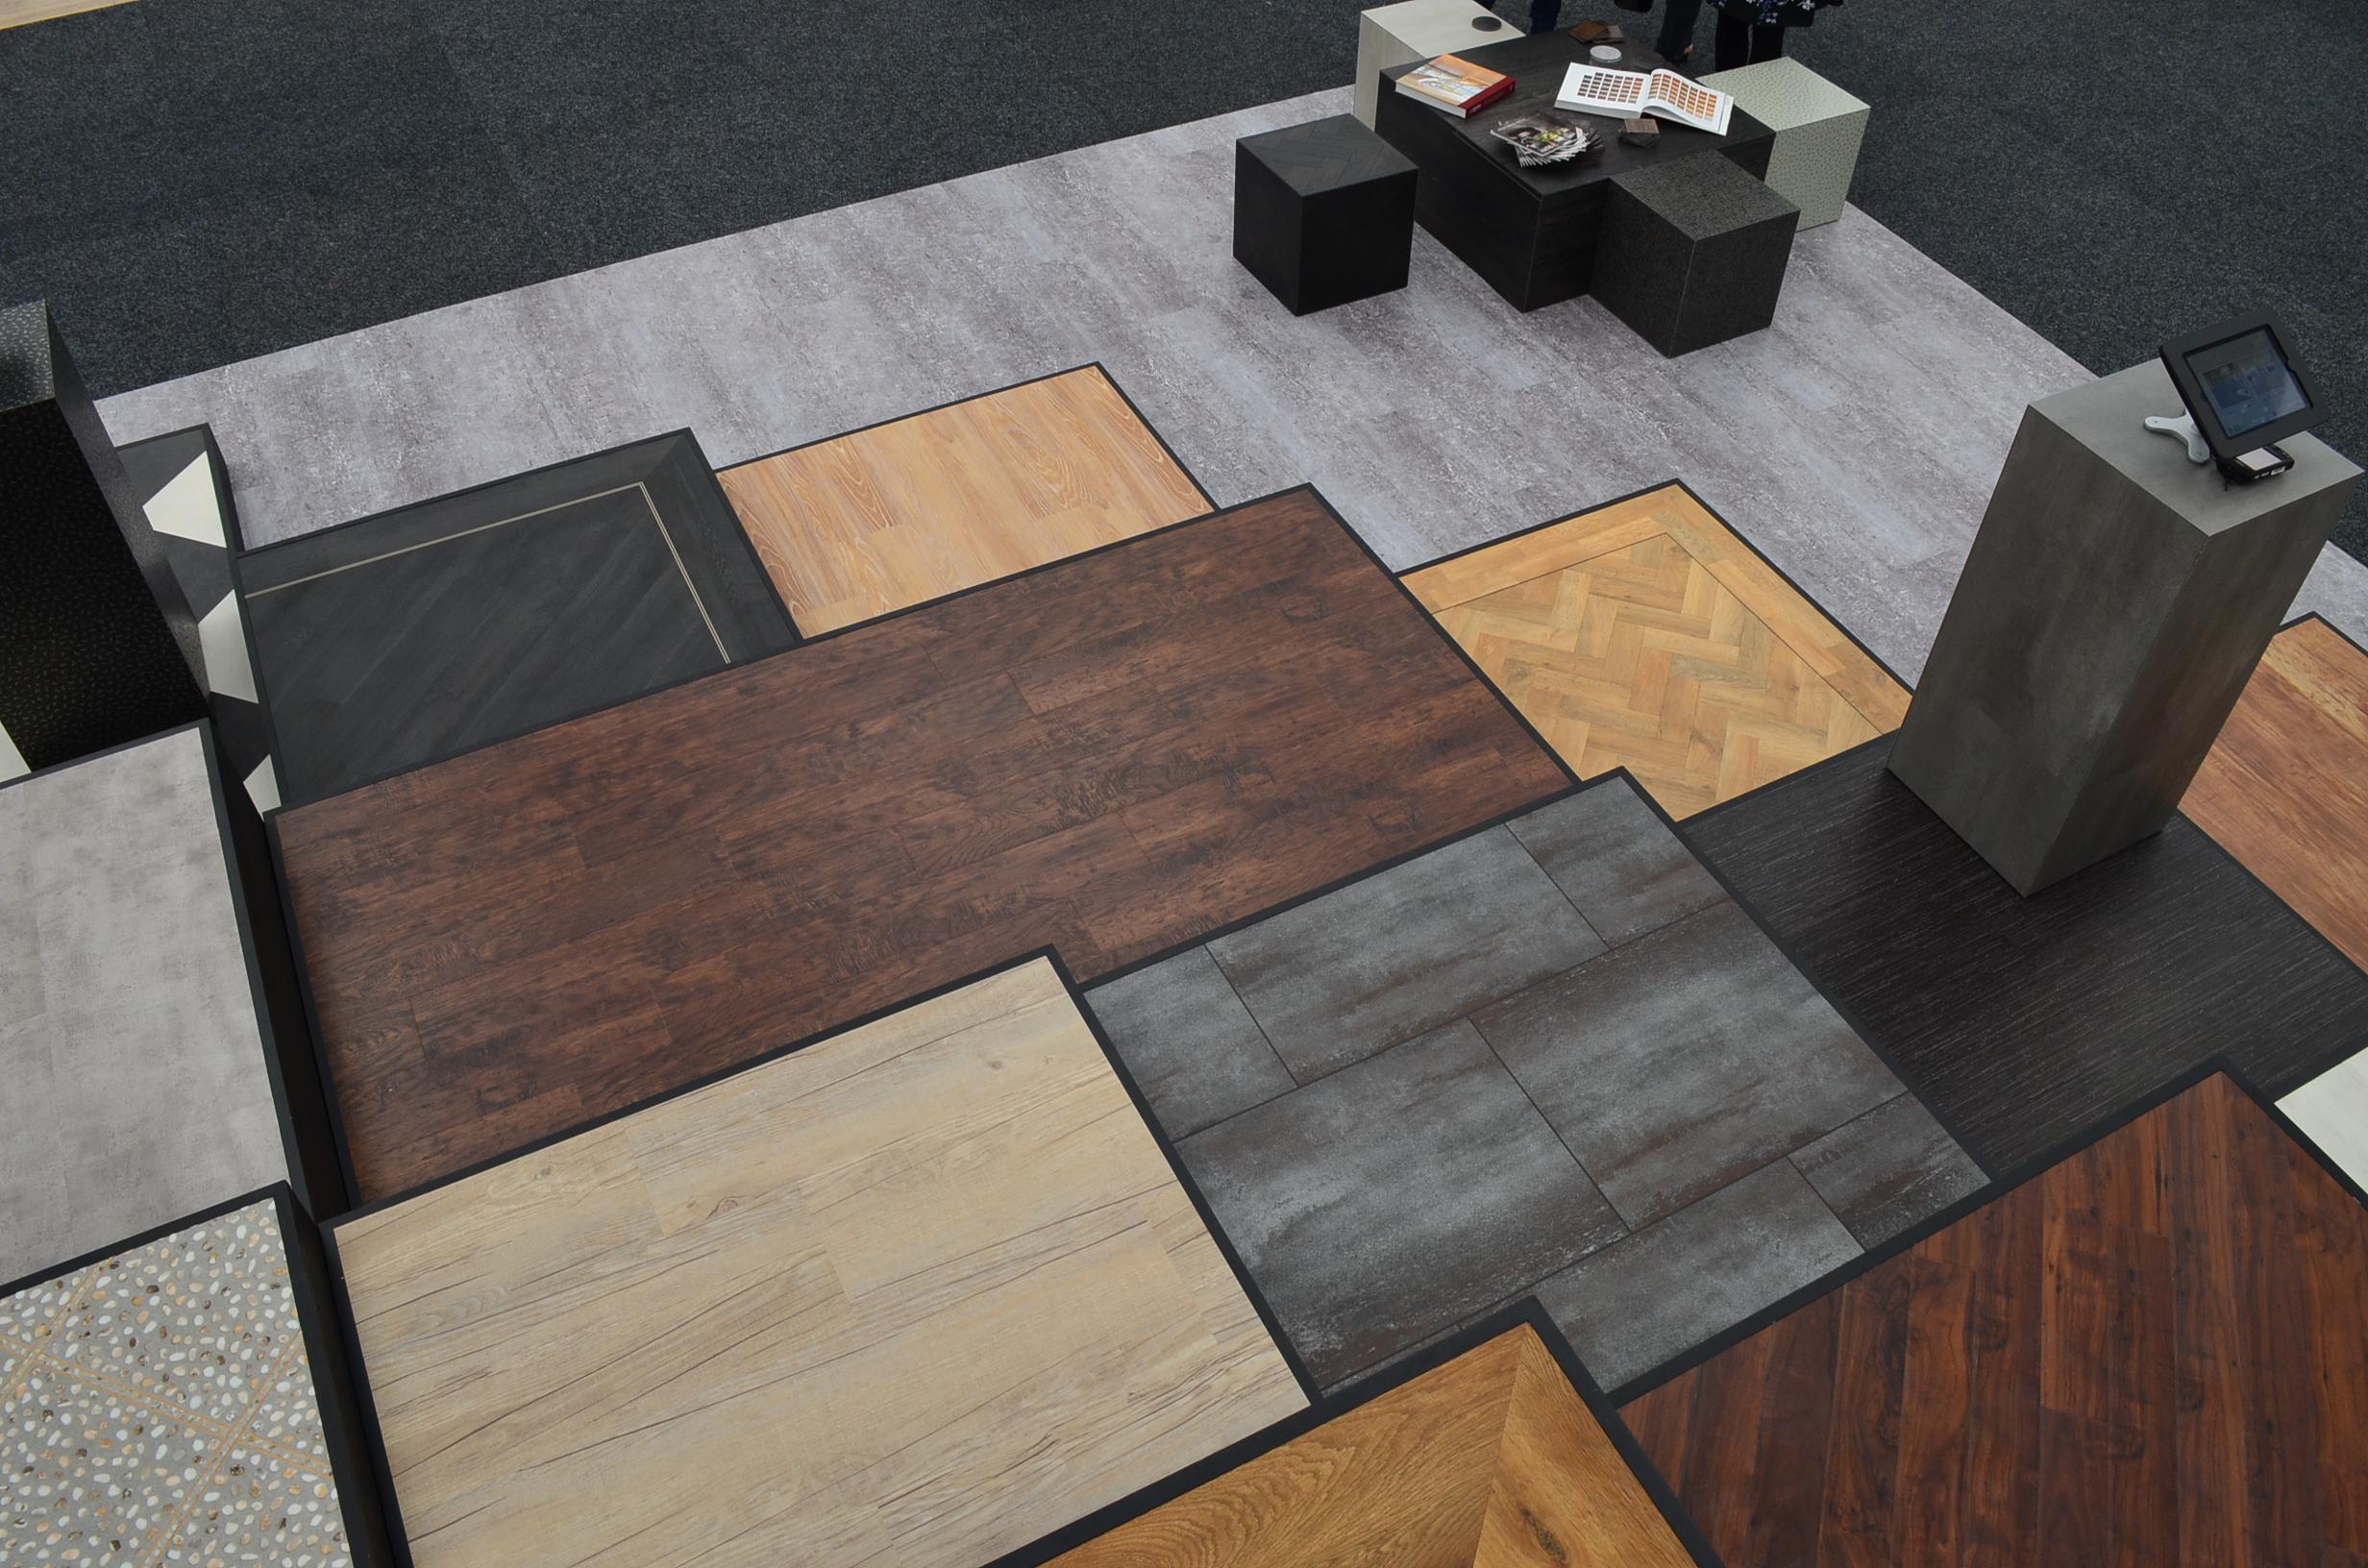 Designex - Parkour flooring